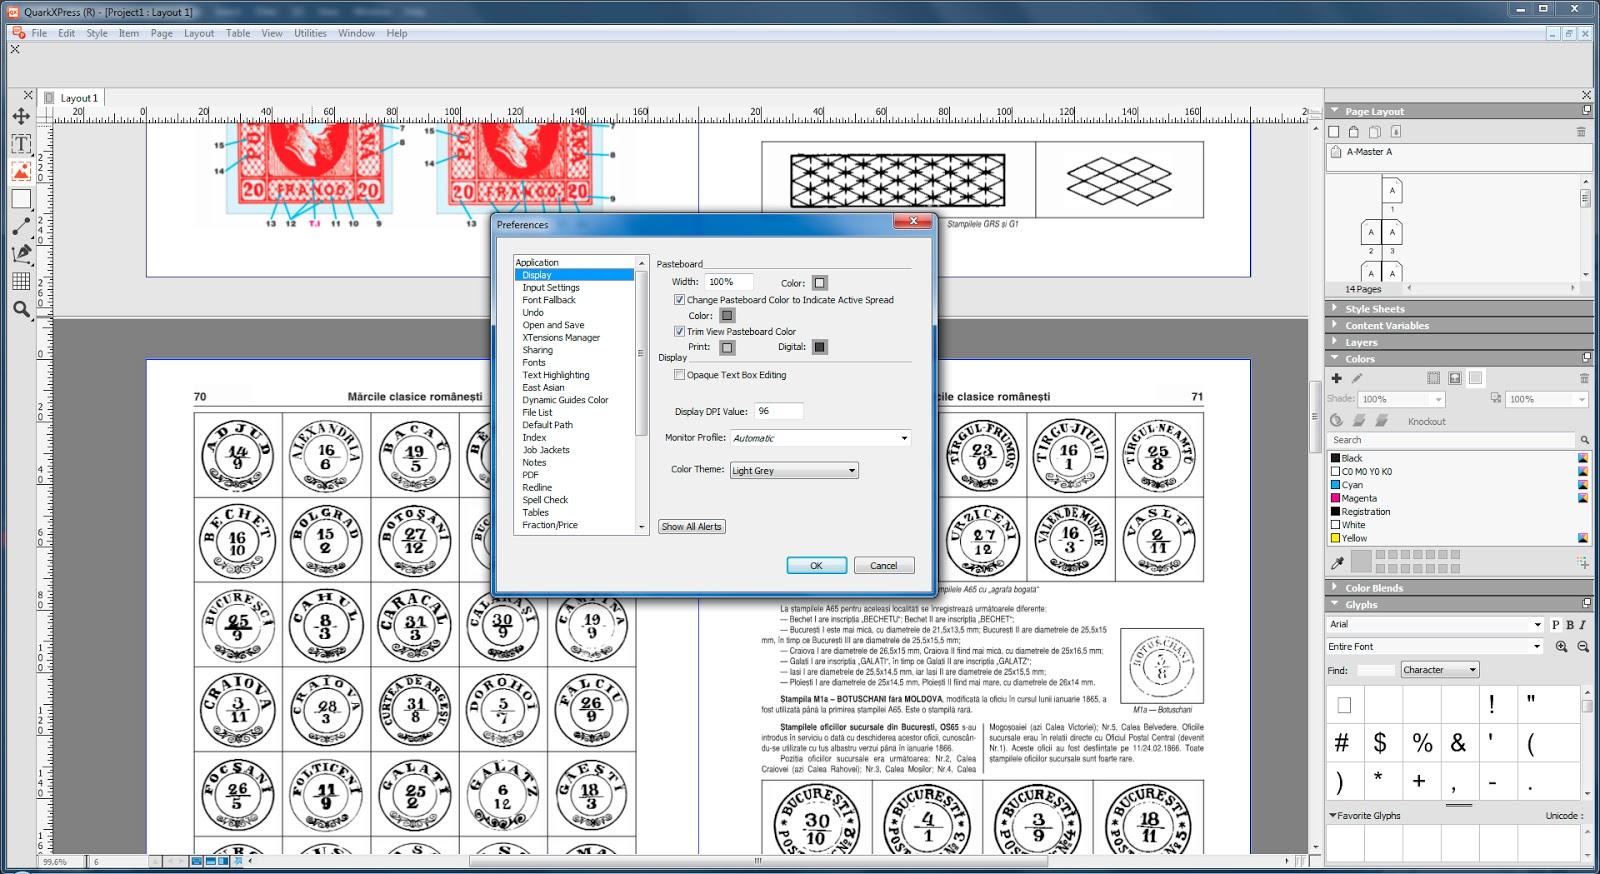 Quarkxpress 10 Crack & Setup Full Download